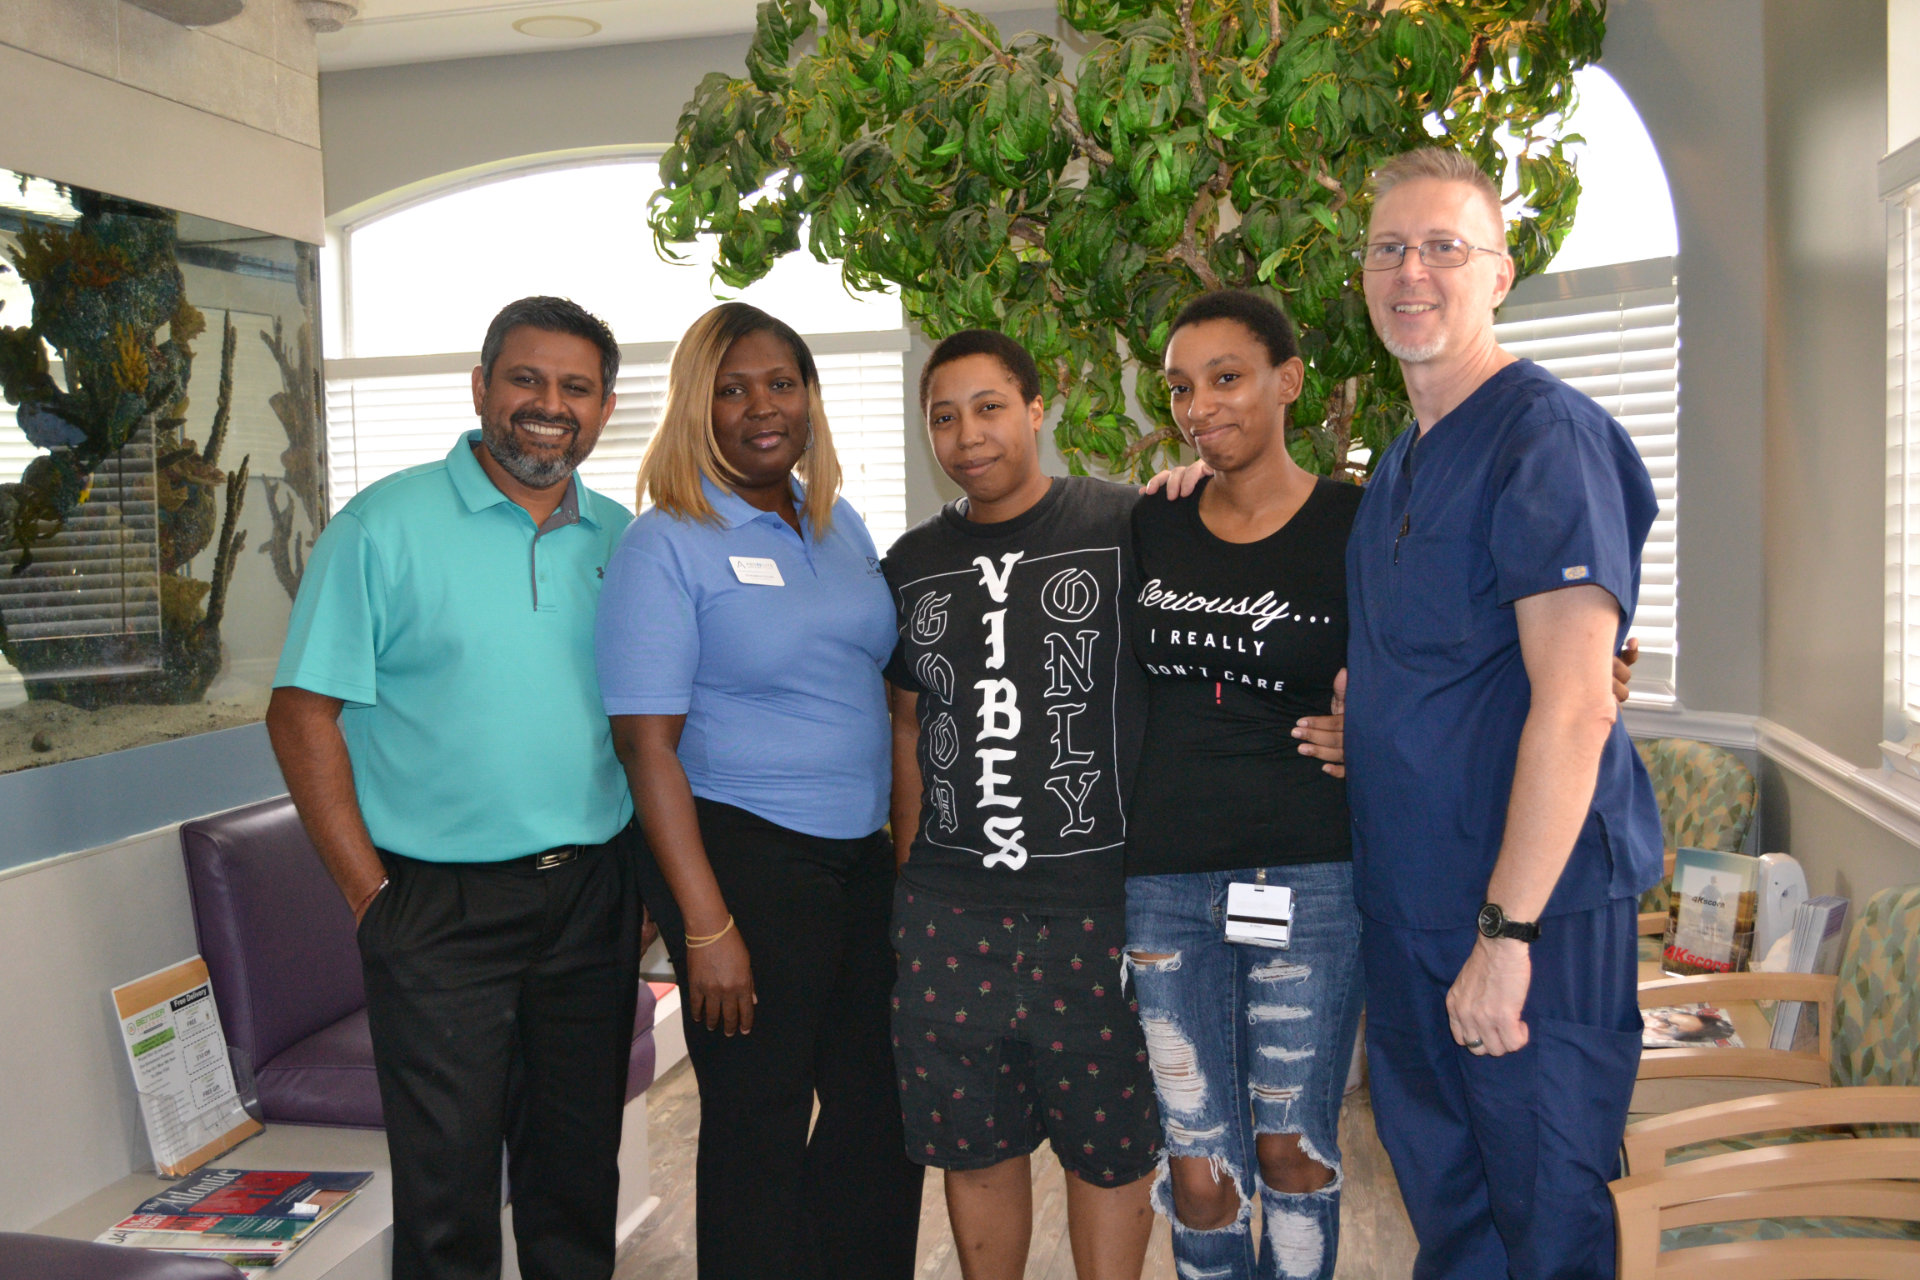 Absolute Injury Patient Testimonial